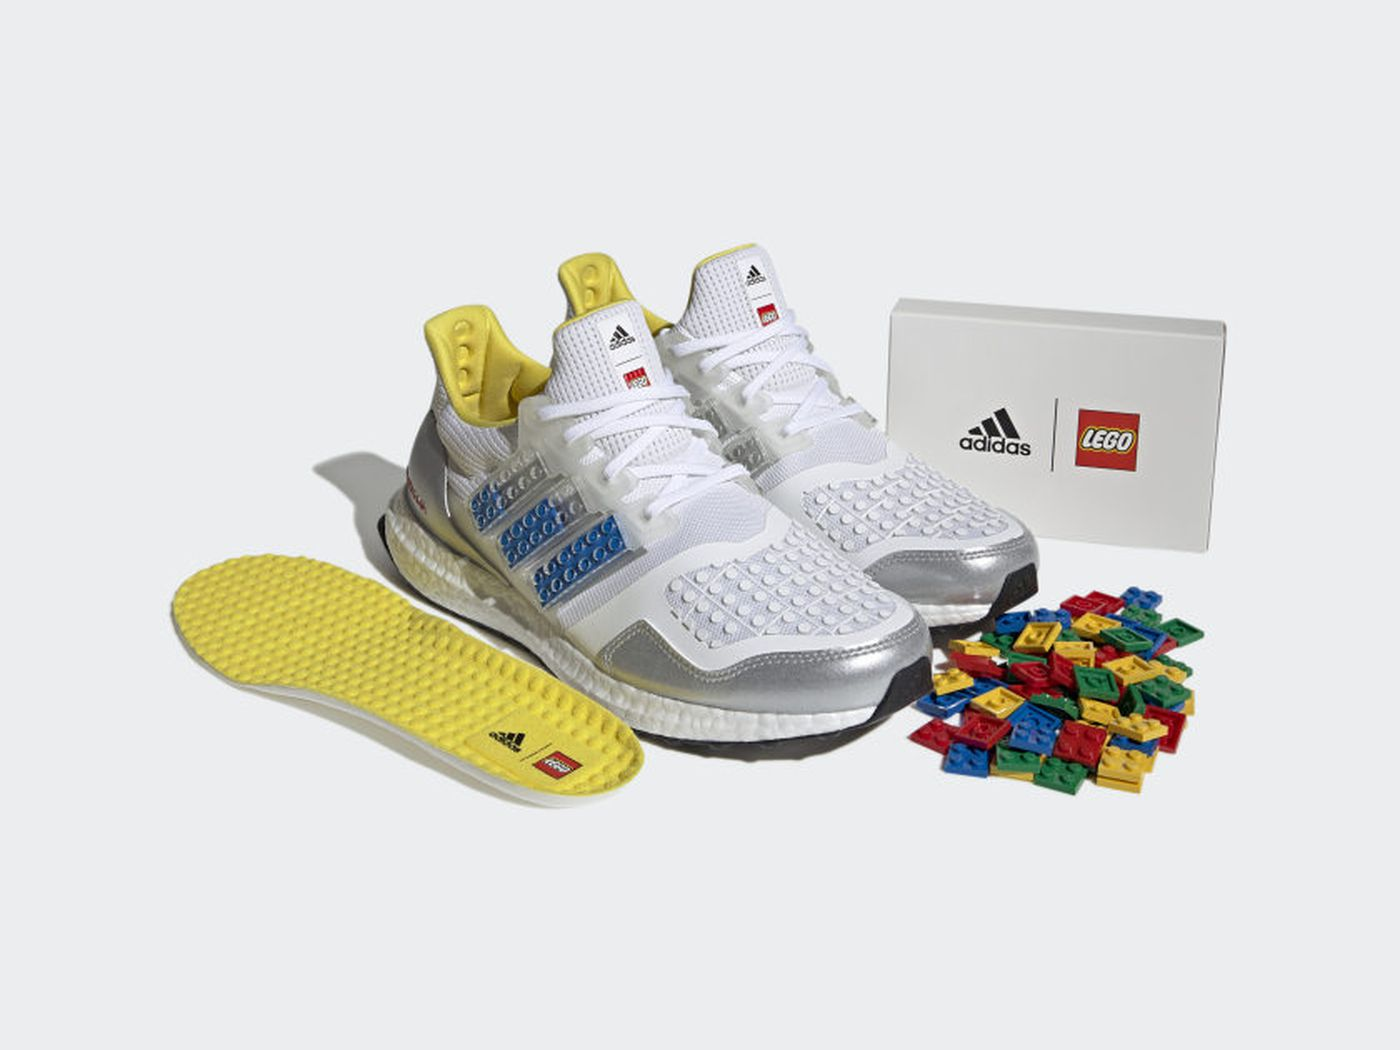 Adidas' new kicks can be customized with Lego bricks - The Verge